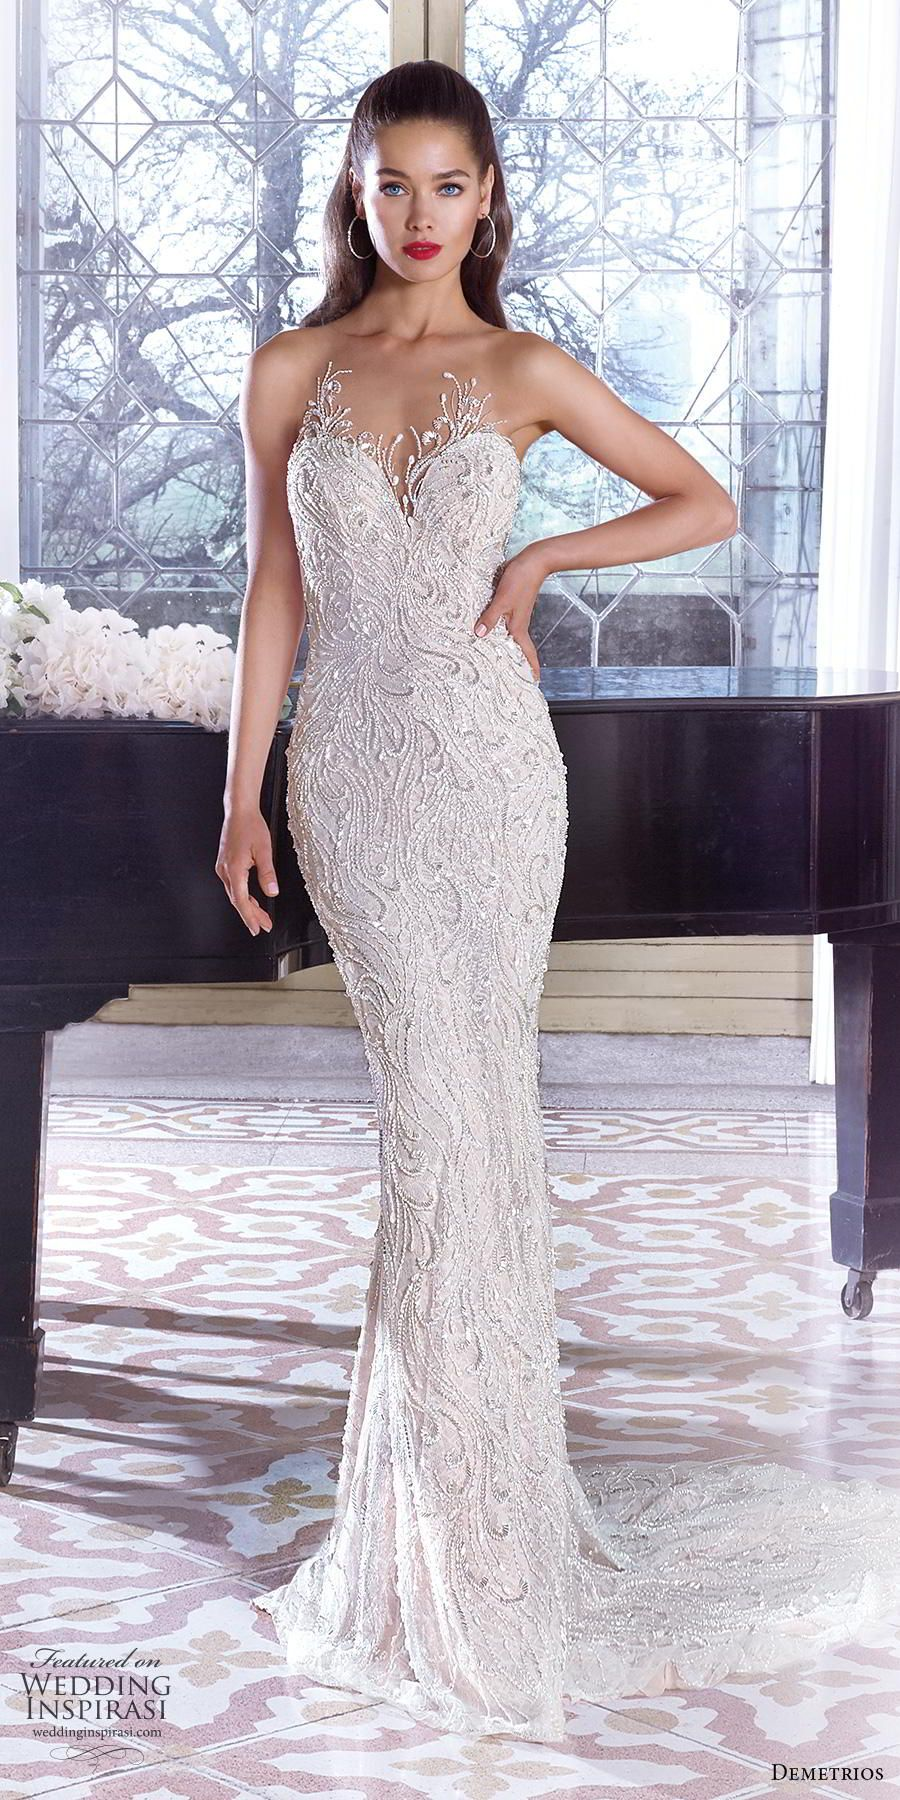 267cf6d61a98e demetrios 2019 bridal strapless sweetheart neckline full embellishment  elegant glamorous fit and flare sheath wedding dress embellished back short  train (8) ...